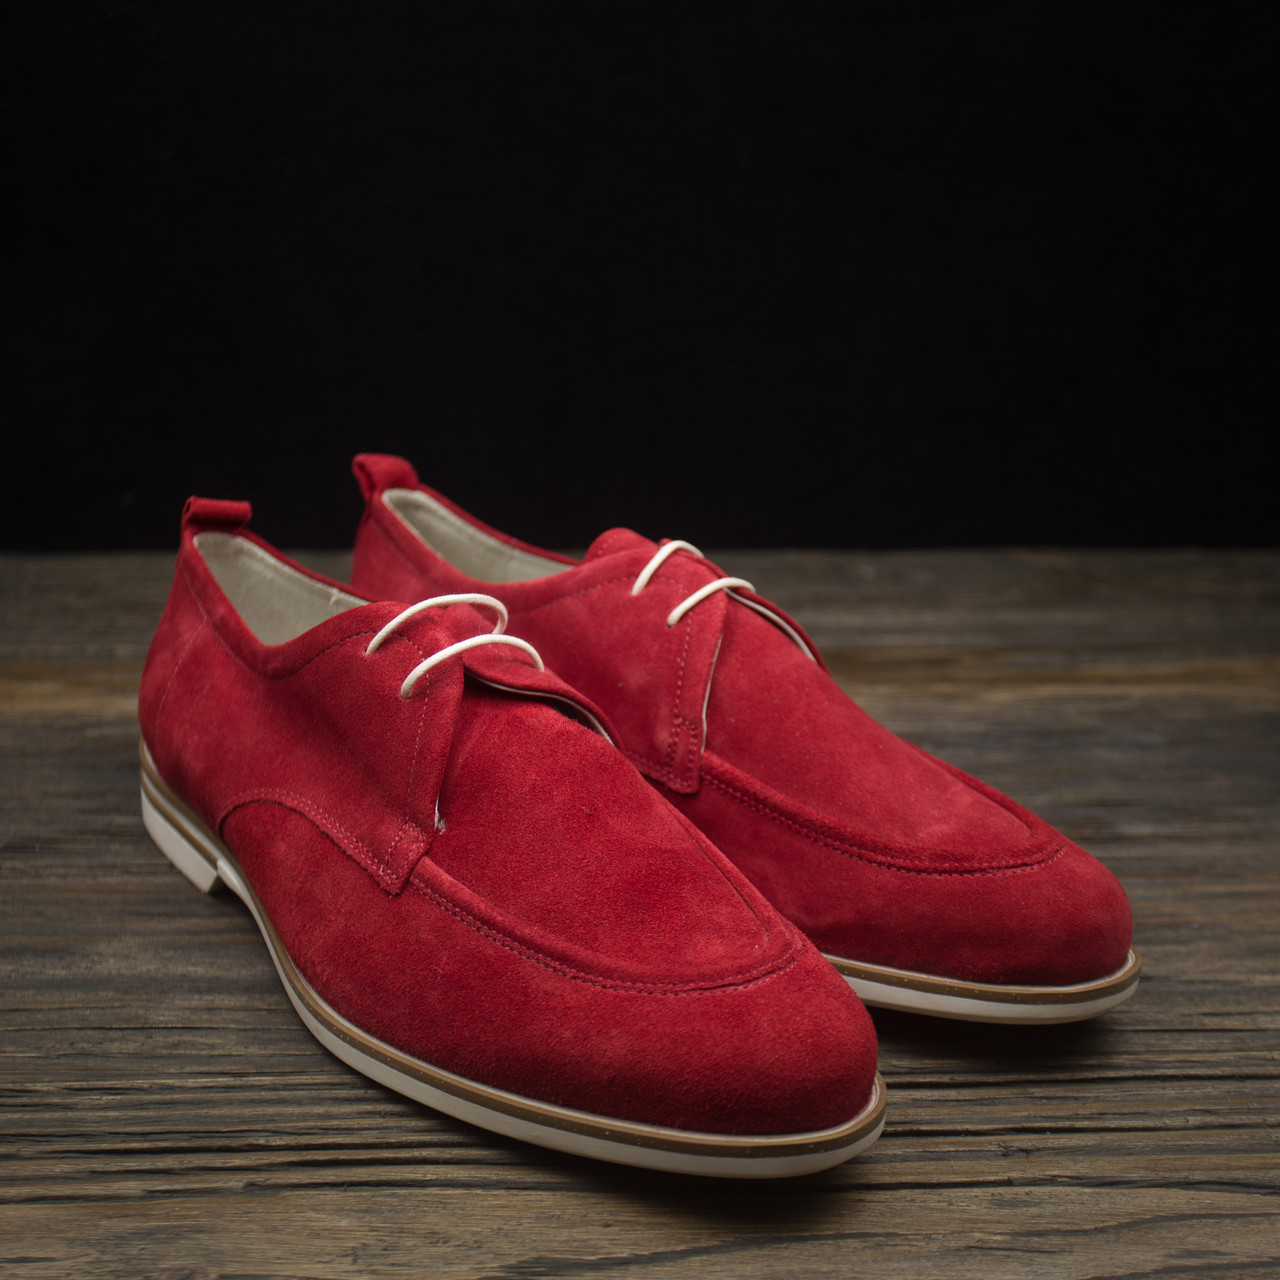 Мужские туфли San Marina р-45, фото 1